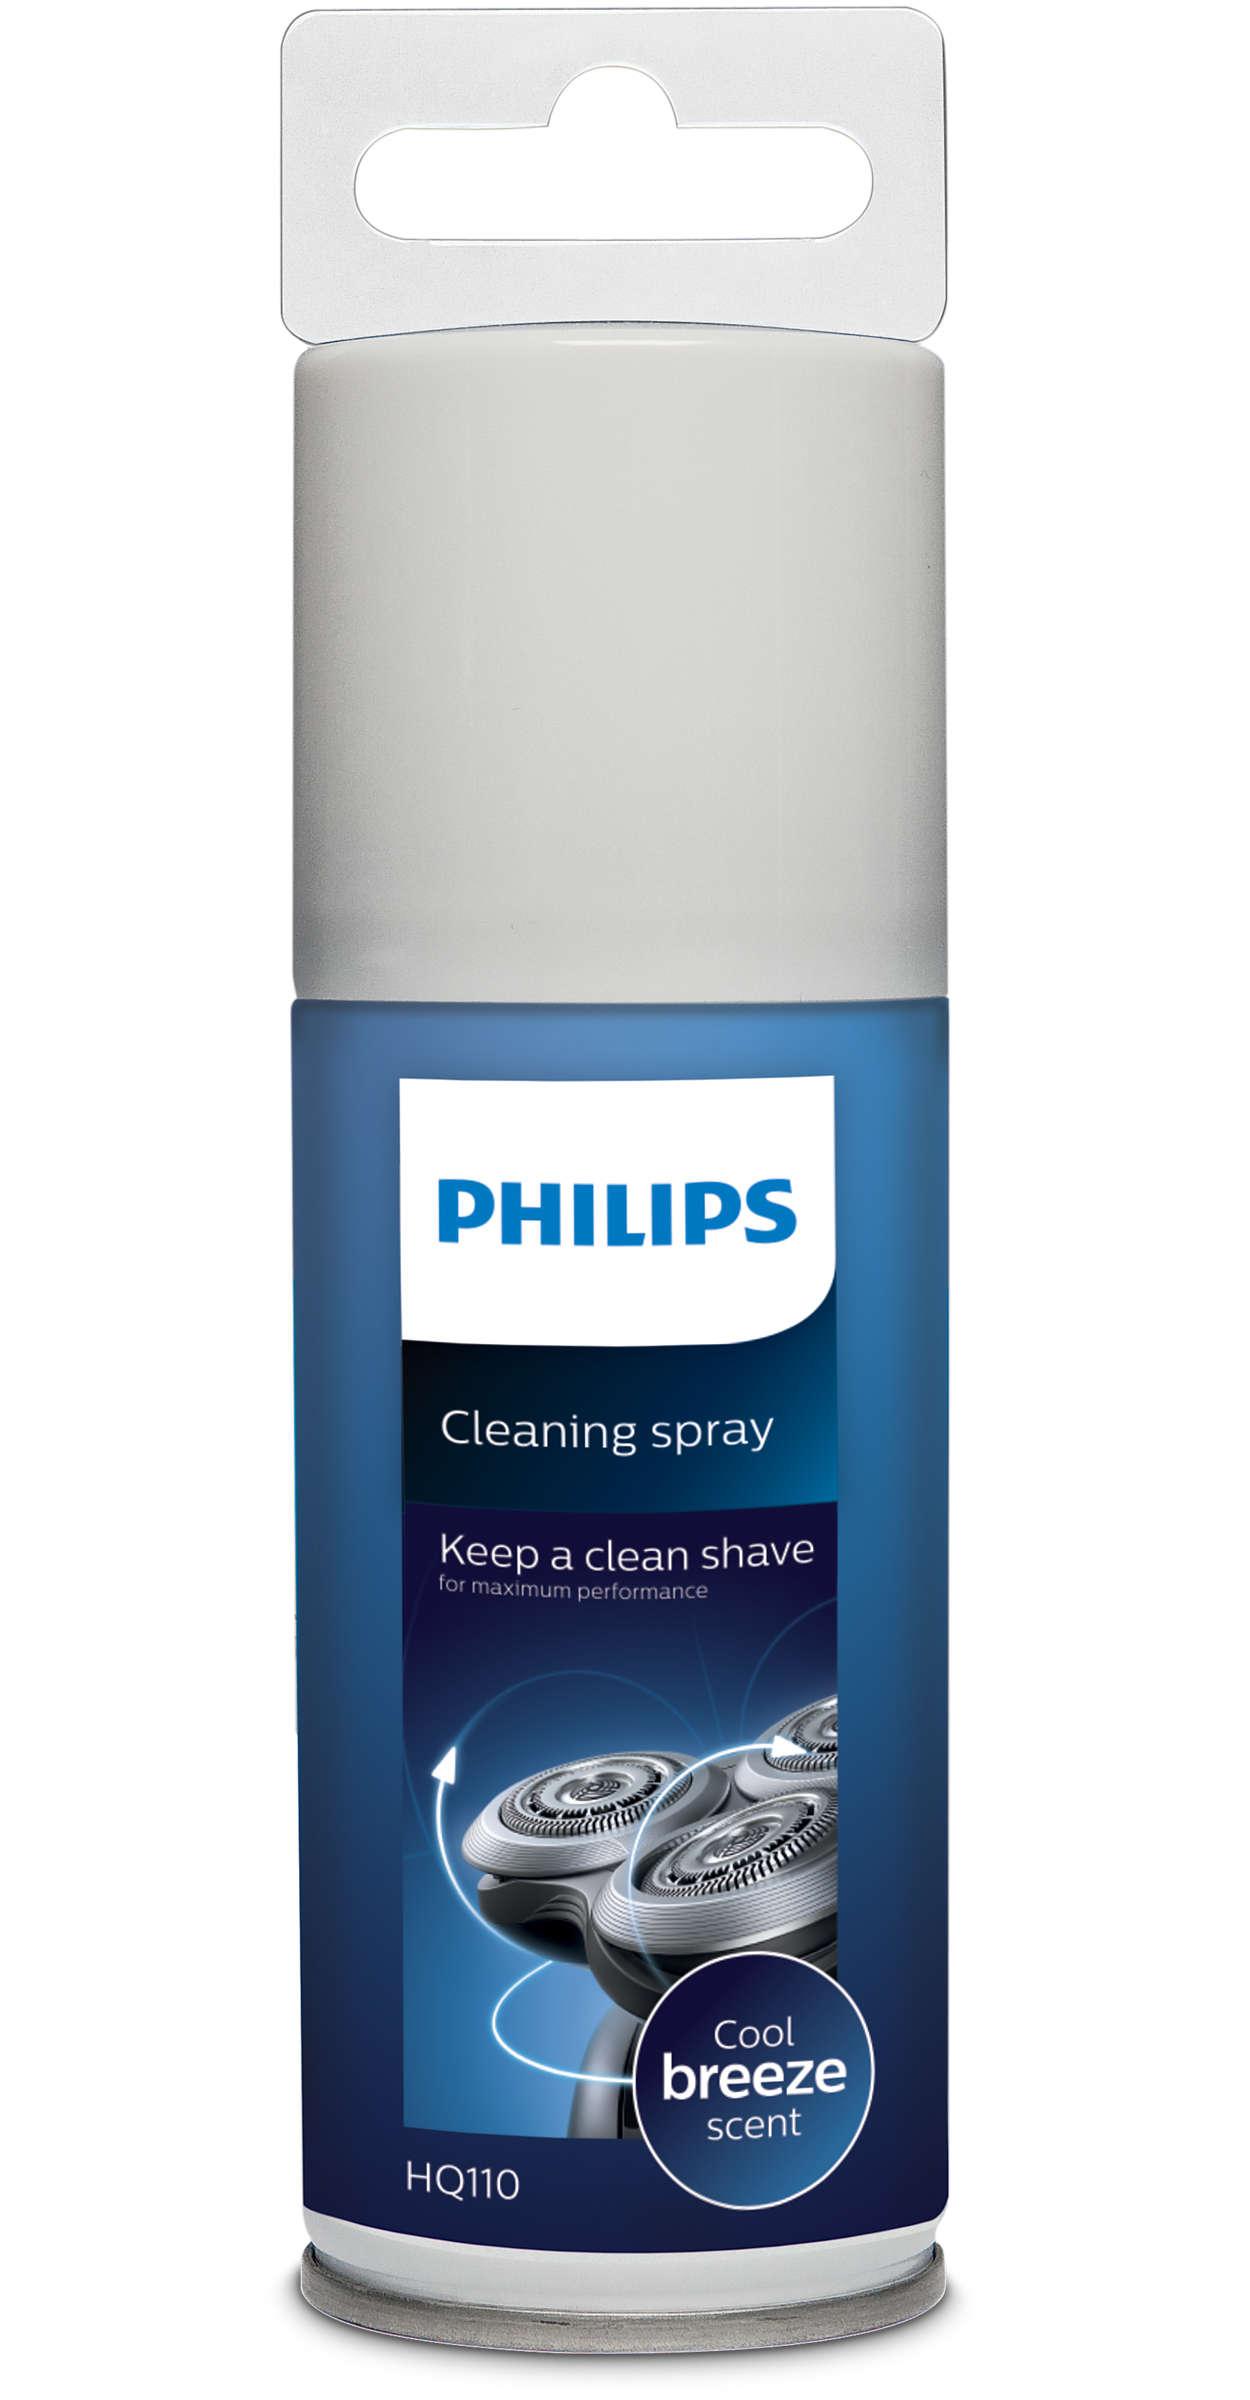 Rasatura pulita